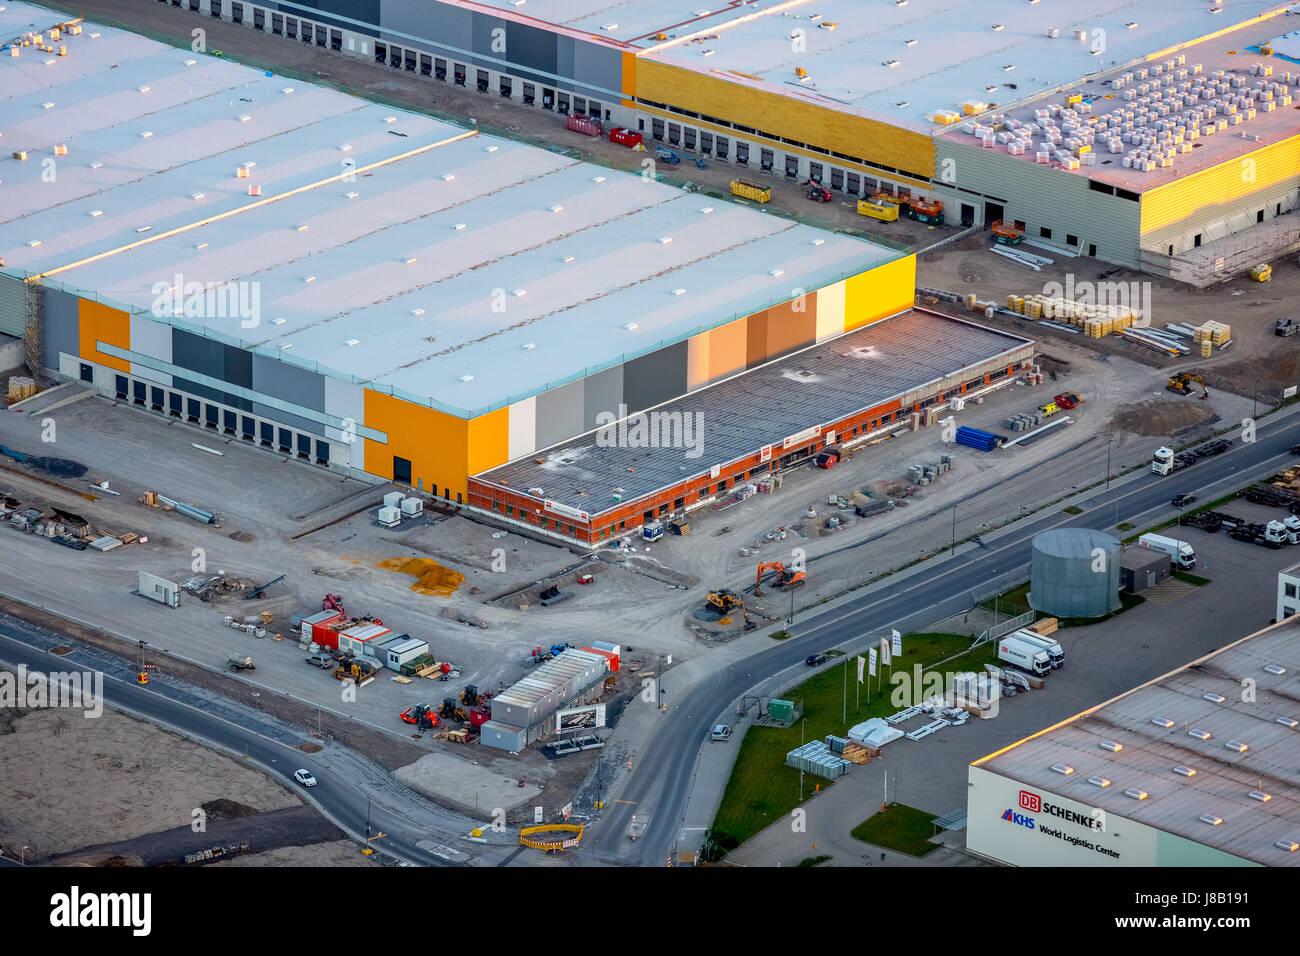 Amazon Logistik, Hallenneubau auf dem Areal der Westfalenhütte, Internethandel, Warenlager, Verteillager, Dortmund, - Stock Image